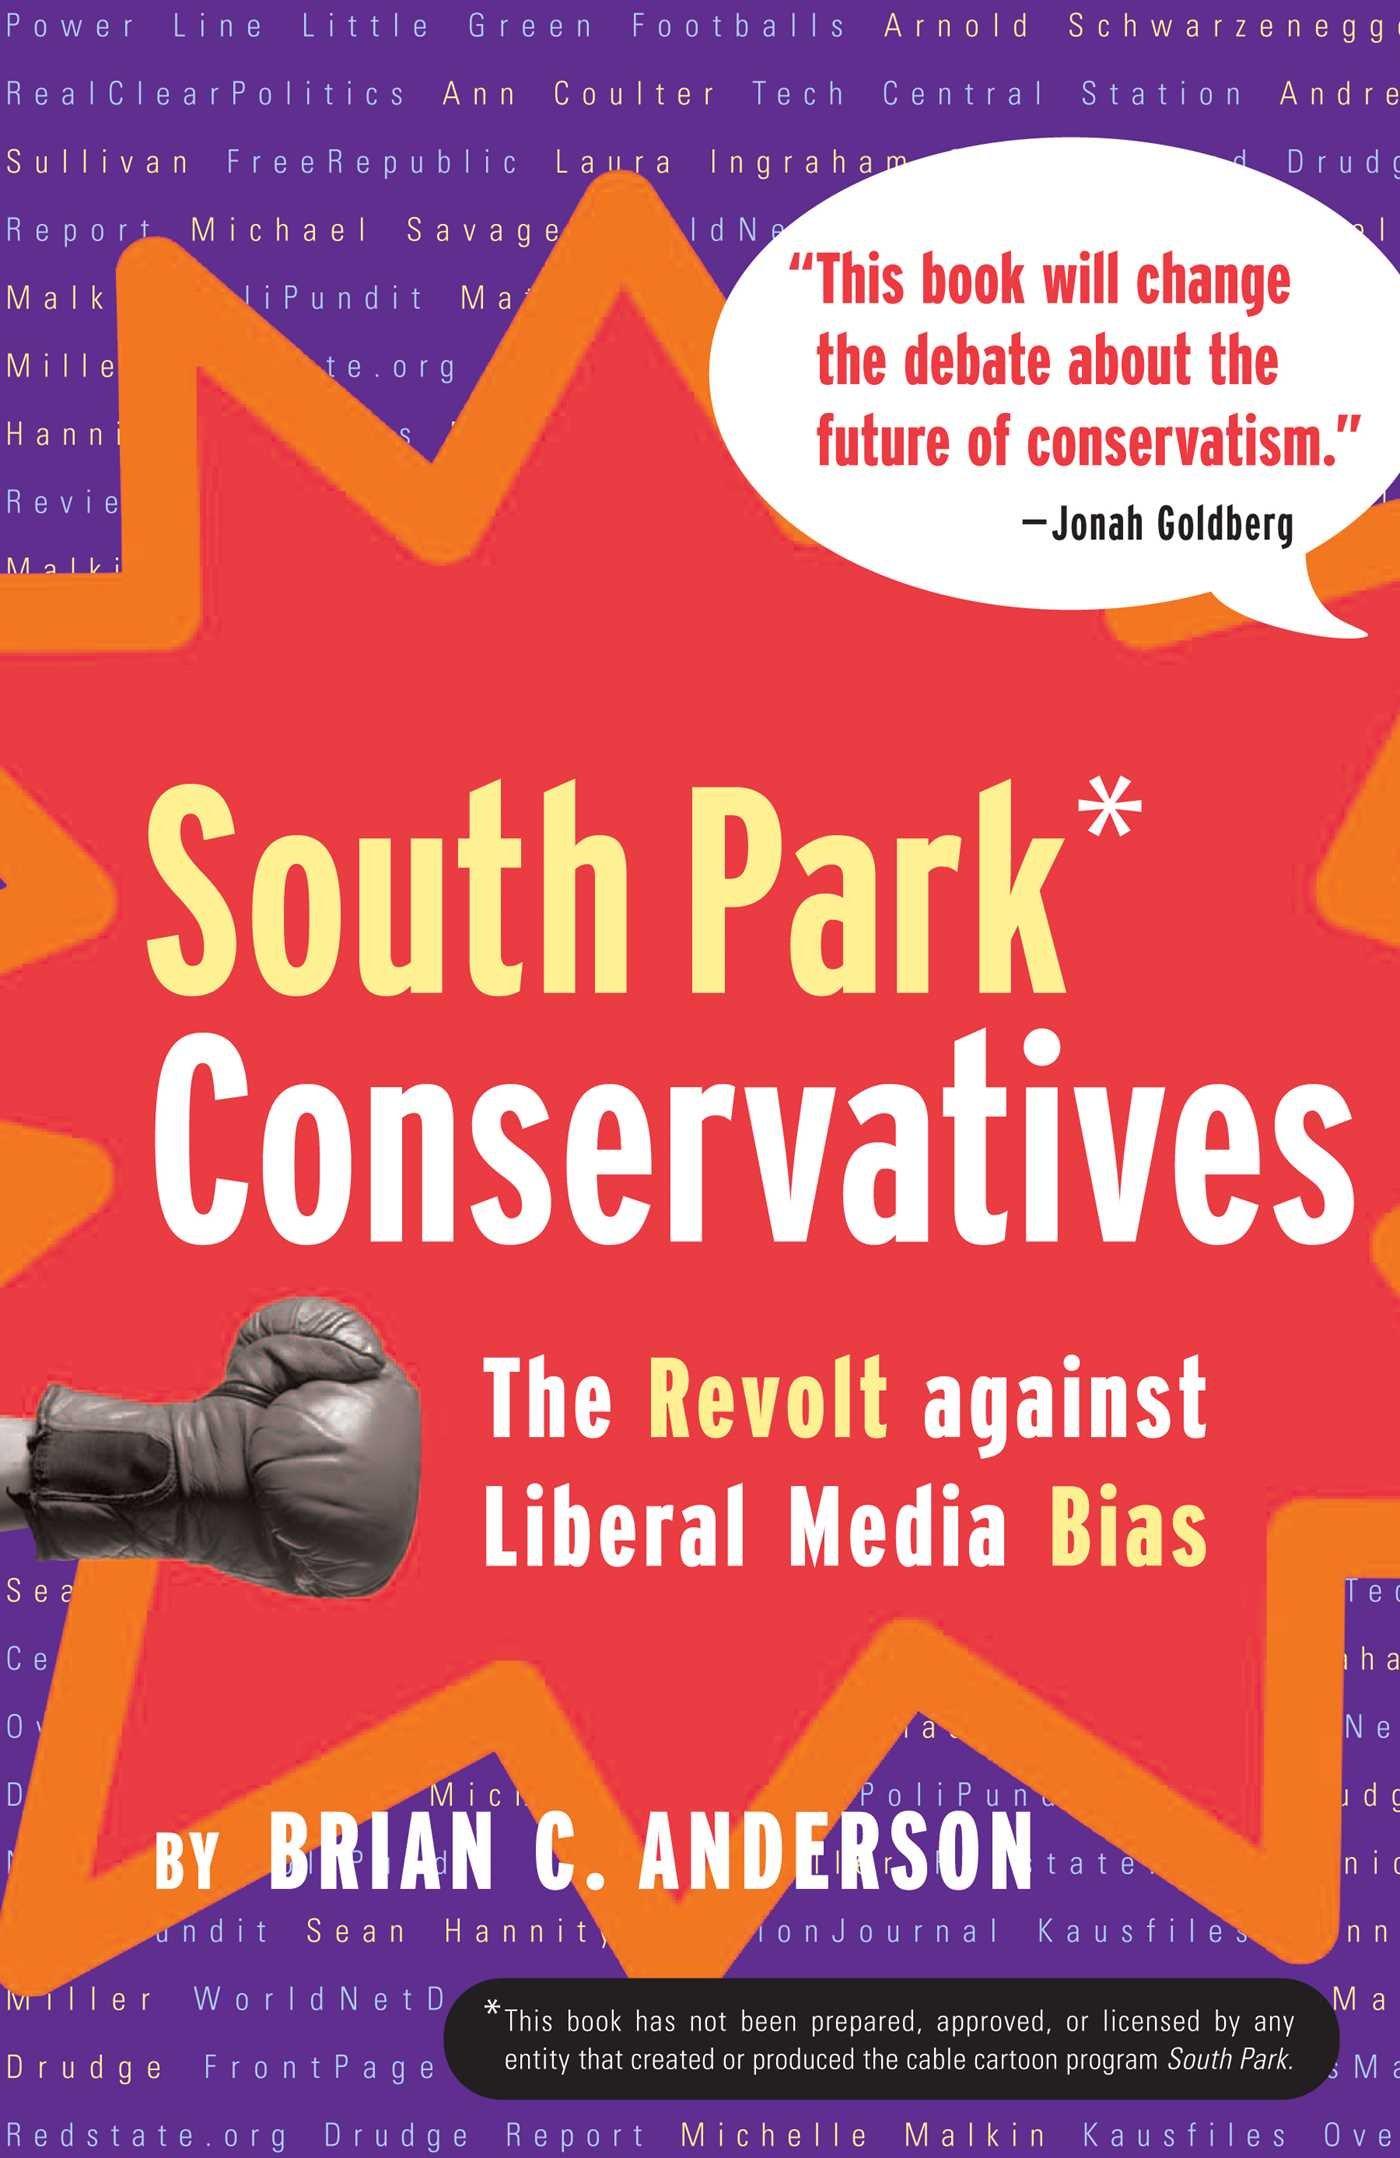 South Park Conservatives: The Revolt Against Liberal Media